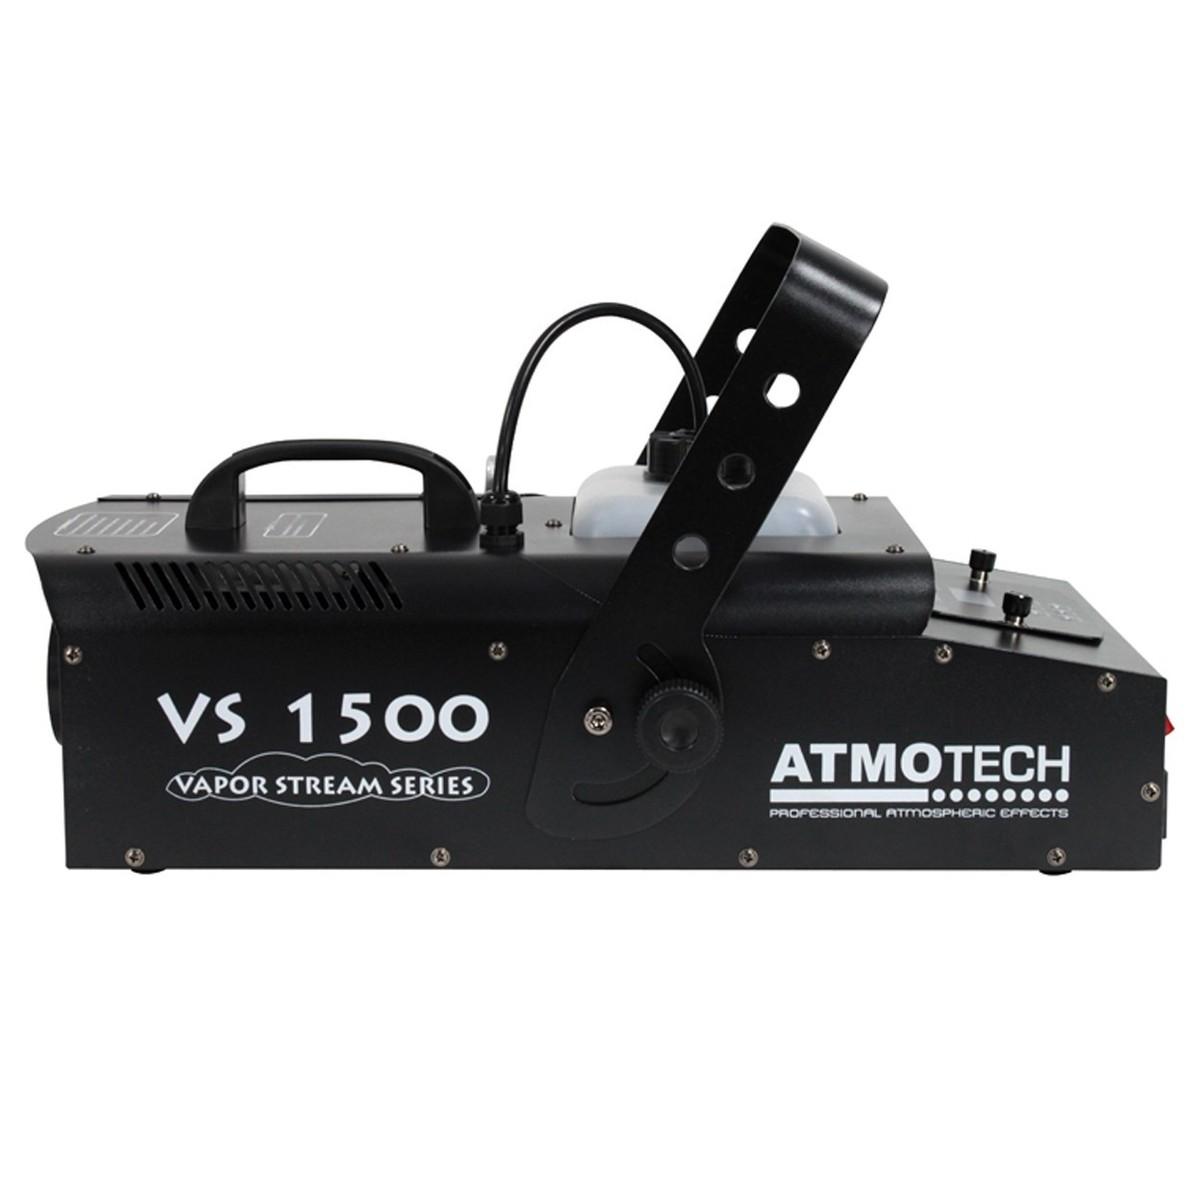 Smoke Machine Hire VS1500 Side